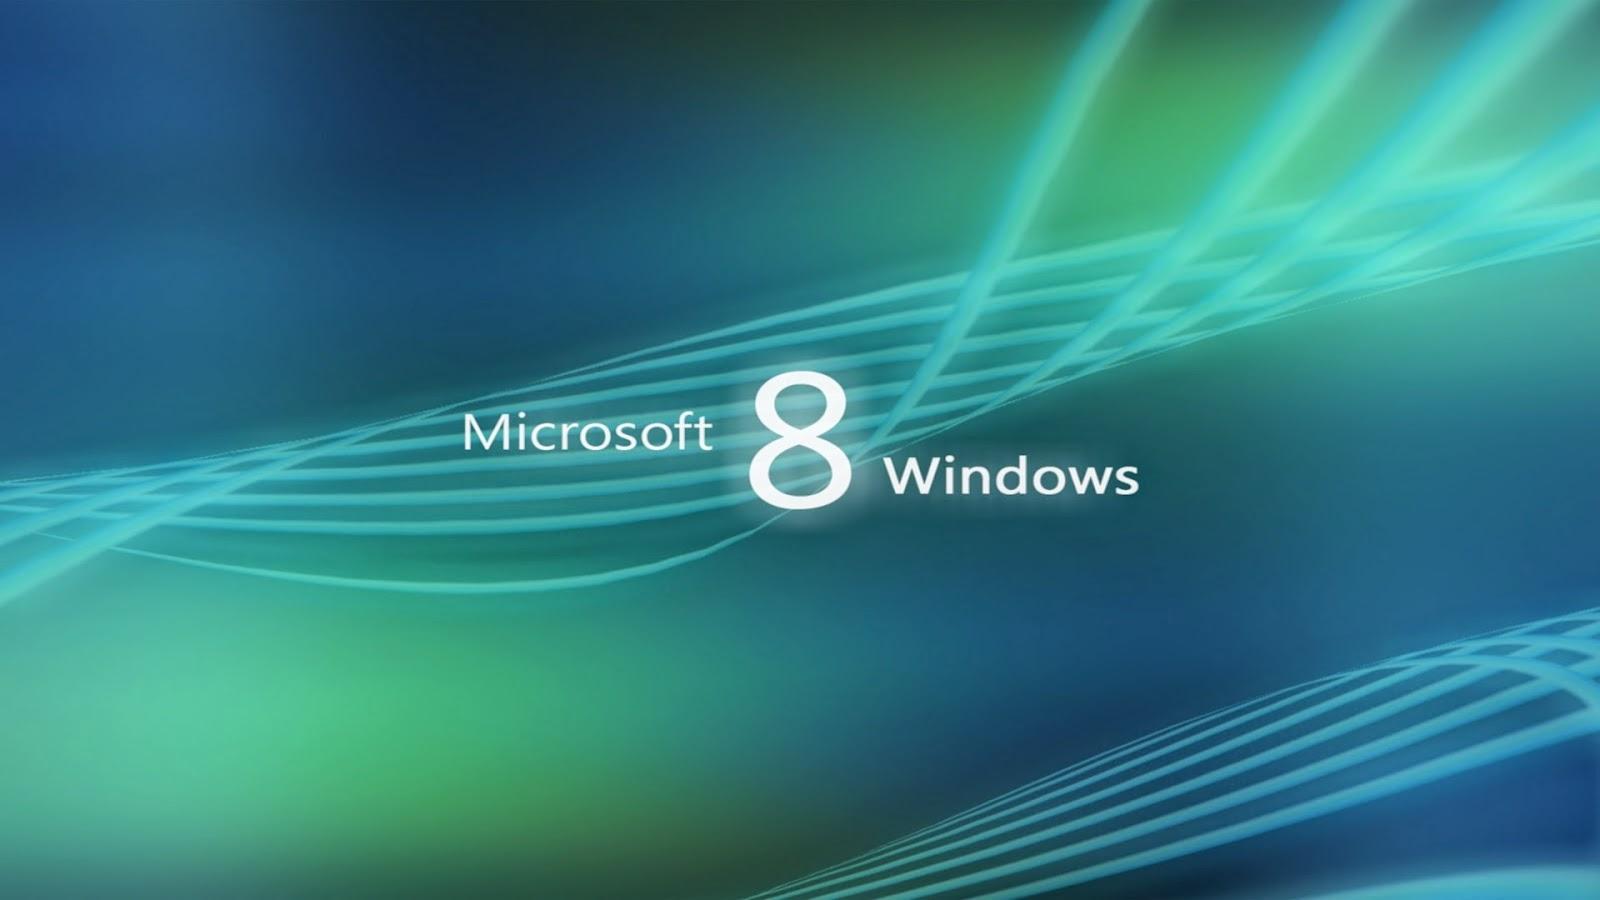 microsoft-windows-8-text-blue-green-aero-glassy-theme-professional-look-wallpaper.jpg